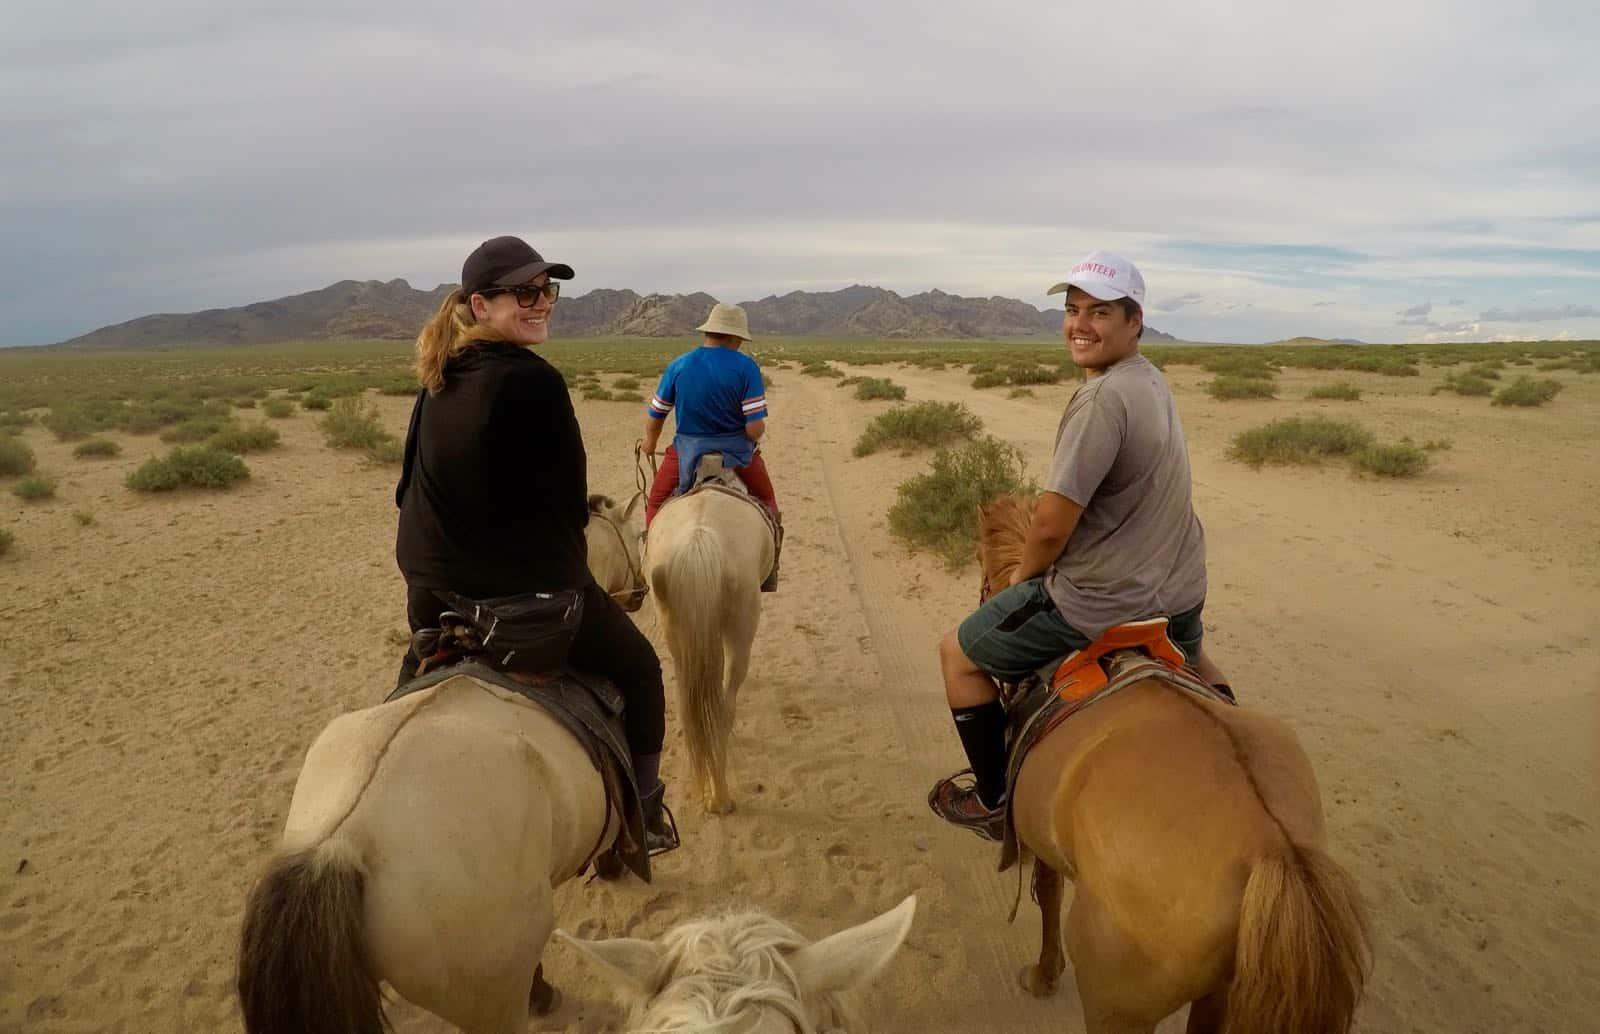 Hannah Piari Horse Trekking Nomads Mongolia betternotstop